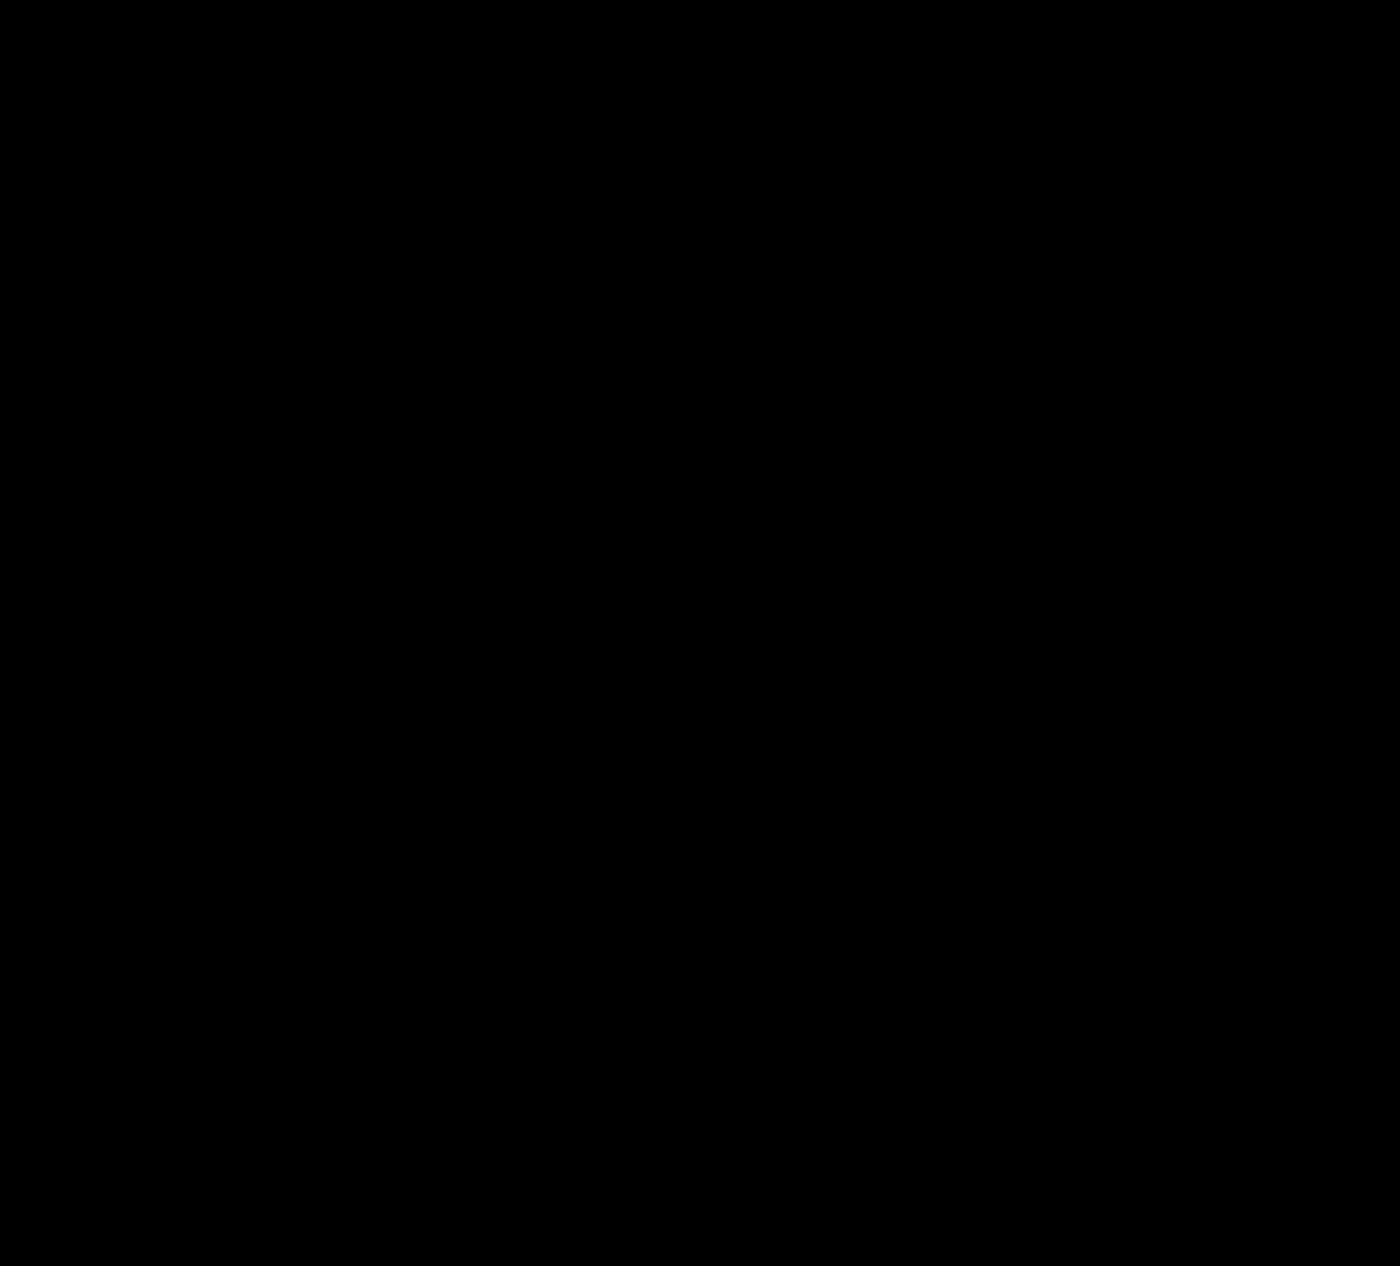 Bornholmer Standuhr aus dem 19. Jahrhundert